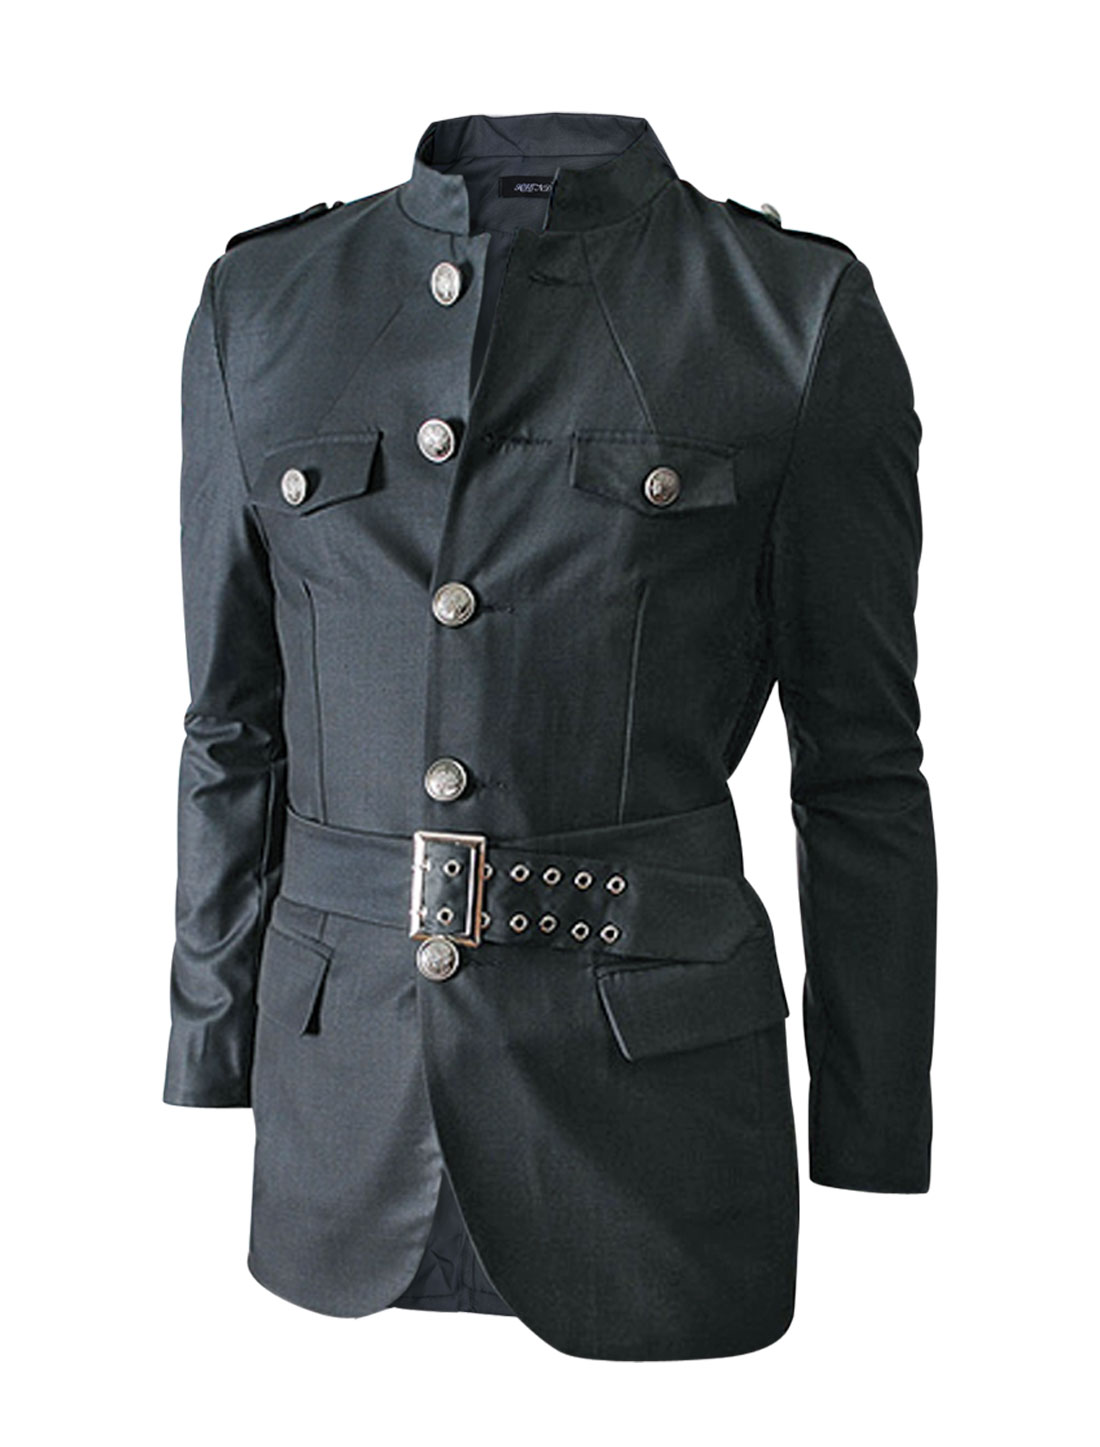 Men Single Breasted w Vertical Pockets Front Split Back Military Jacket Dark Gray M